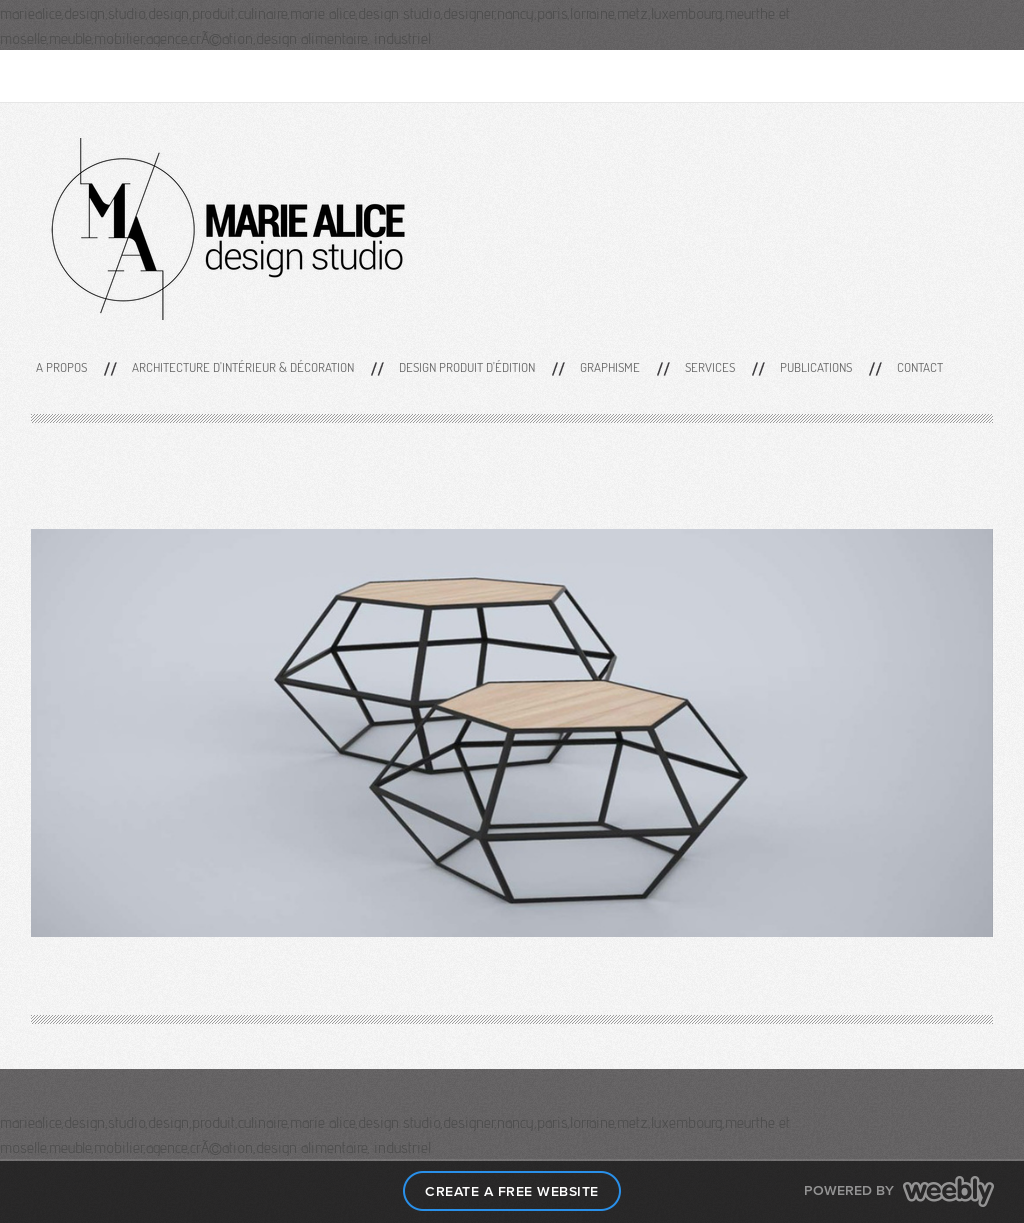 Architecte D Interieur Moselle marie alice design studio competitors, revenue and employees